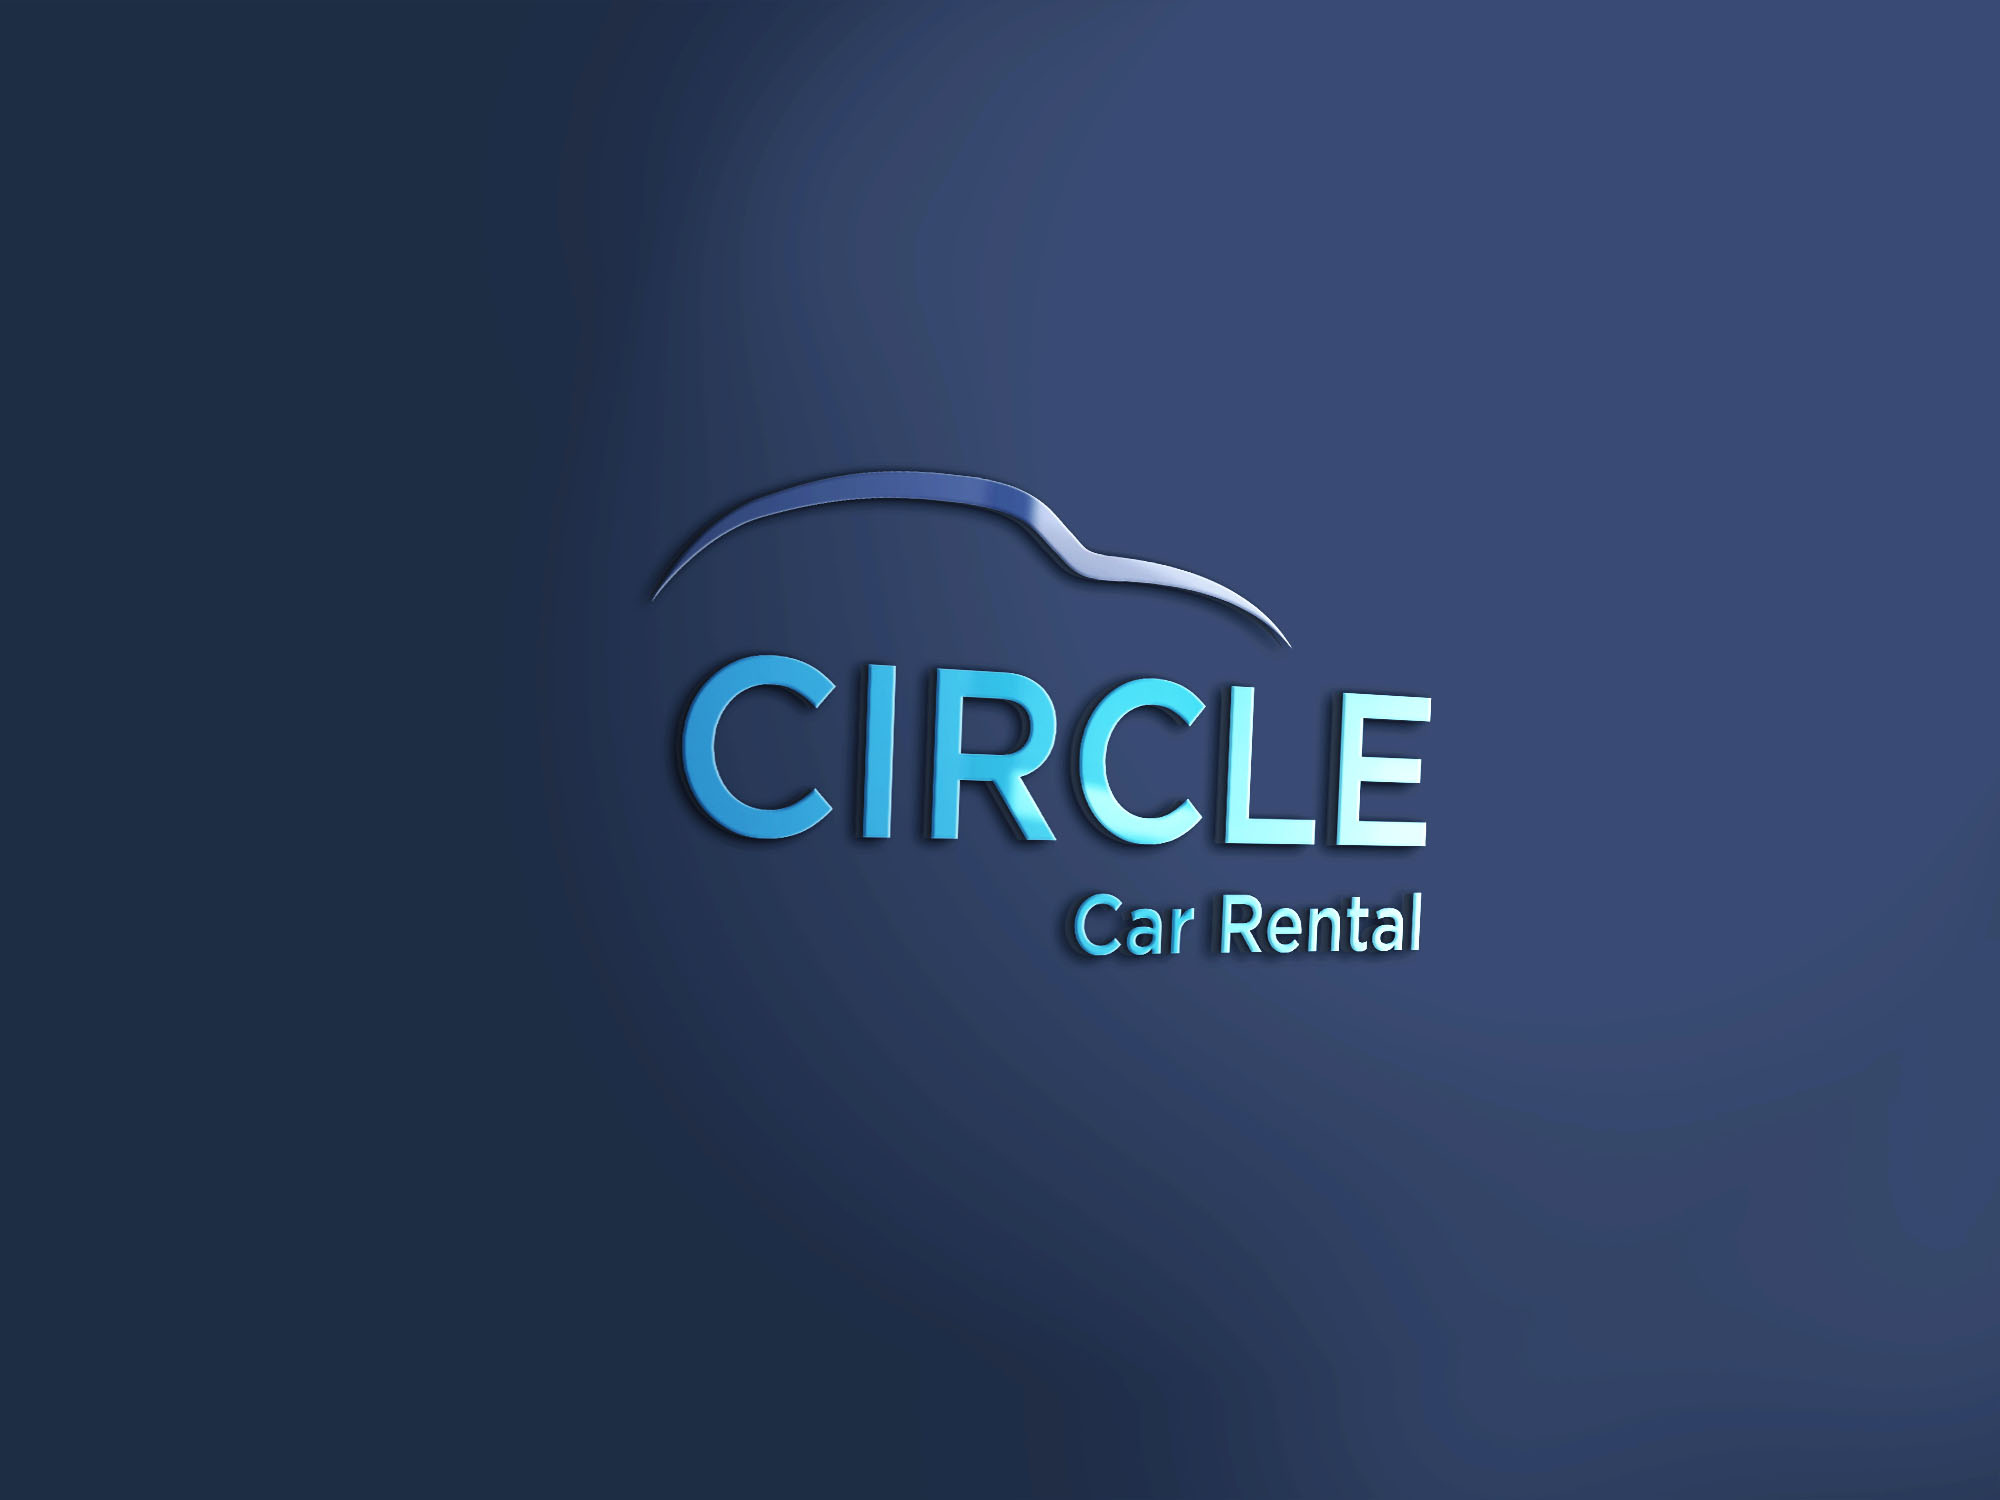 Circle Car Rental 3d Mockup4